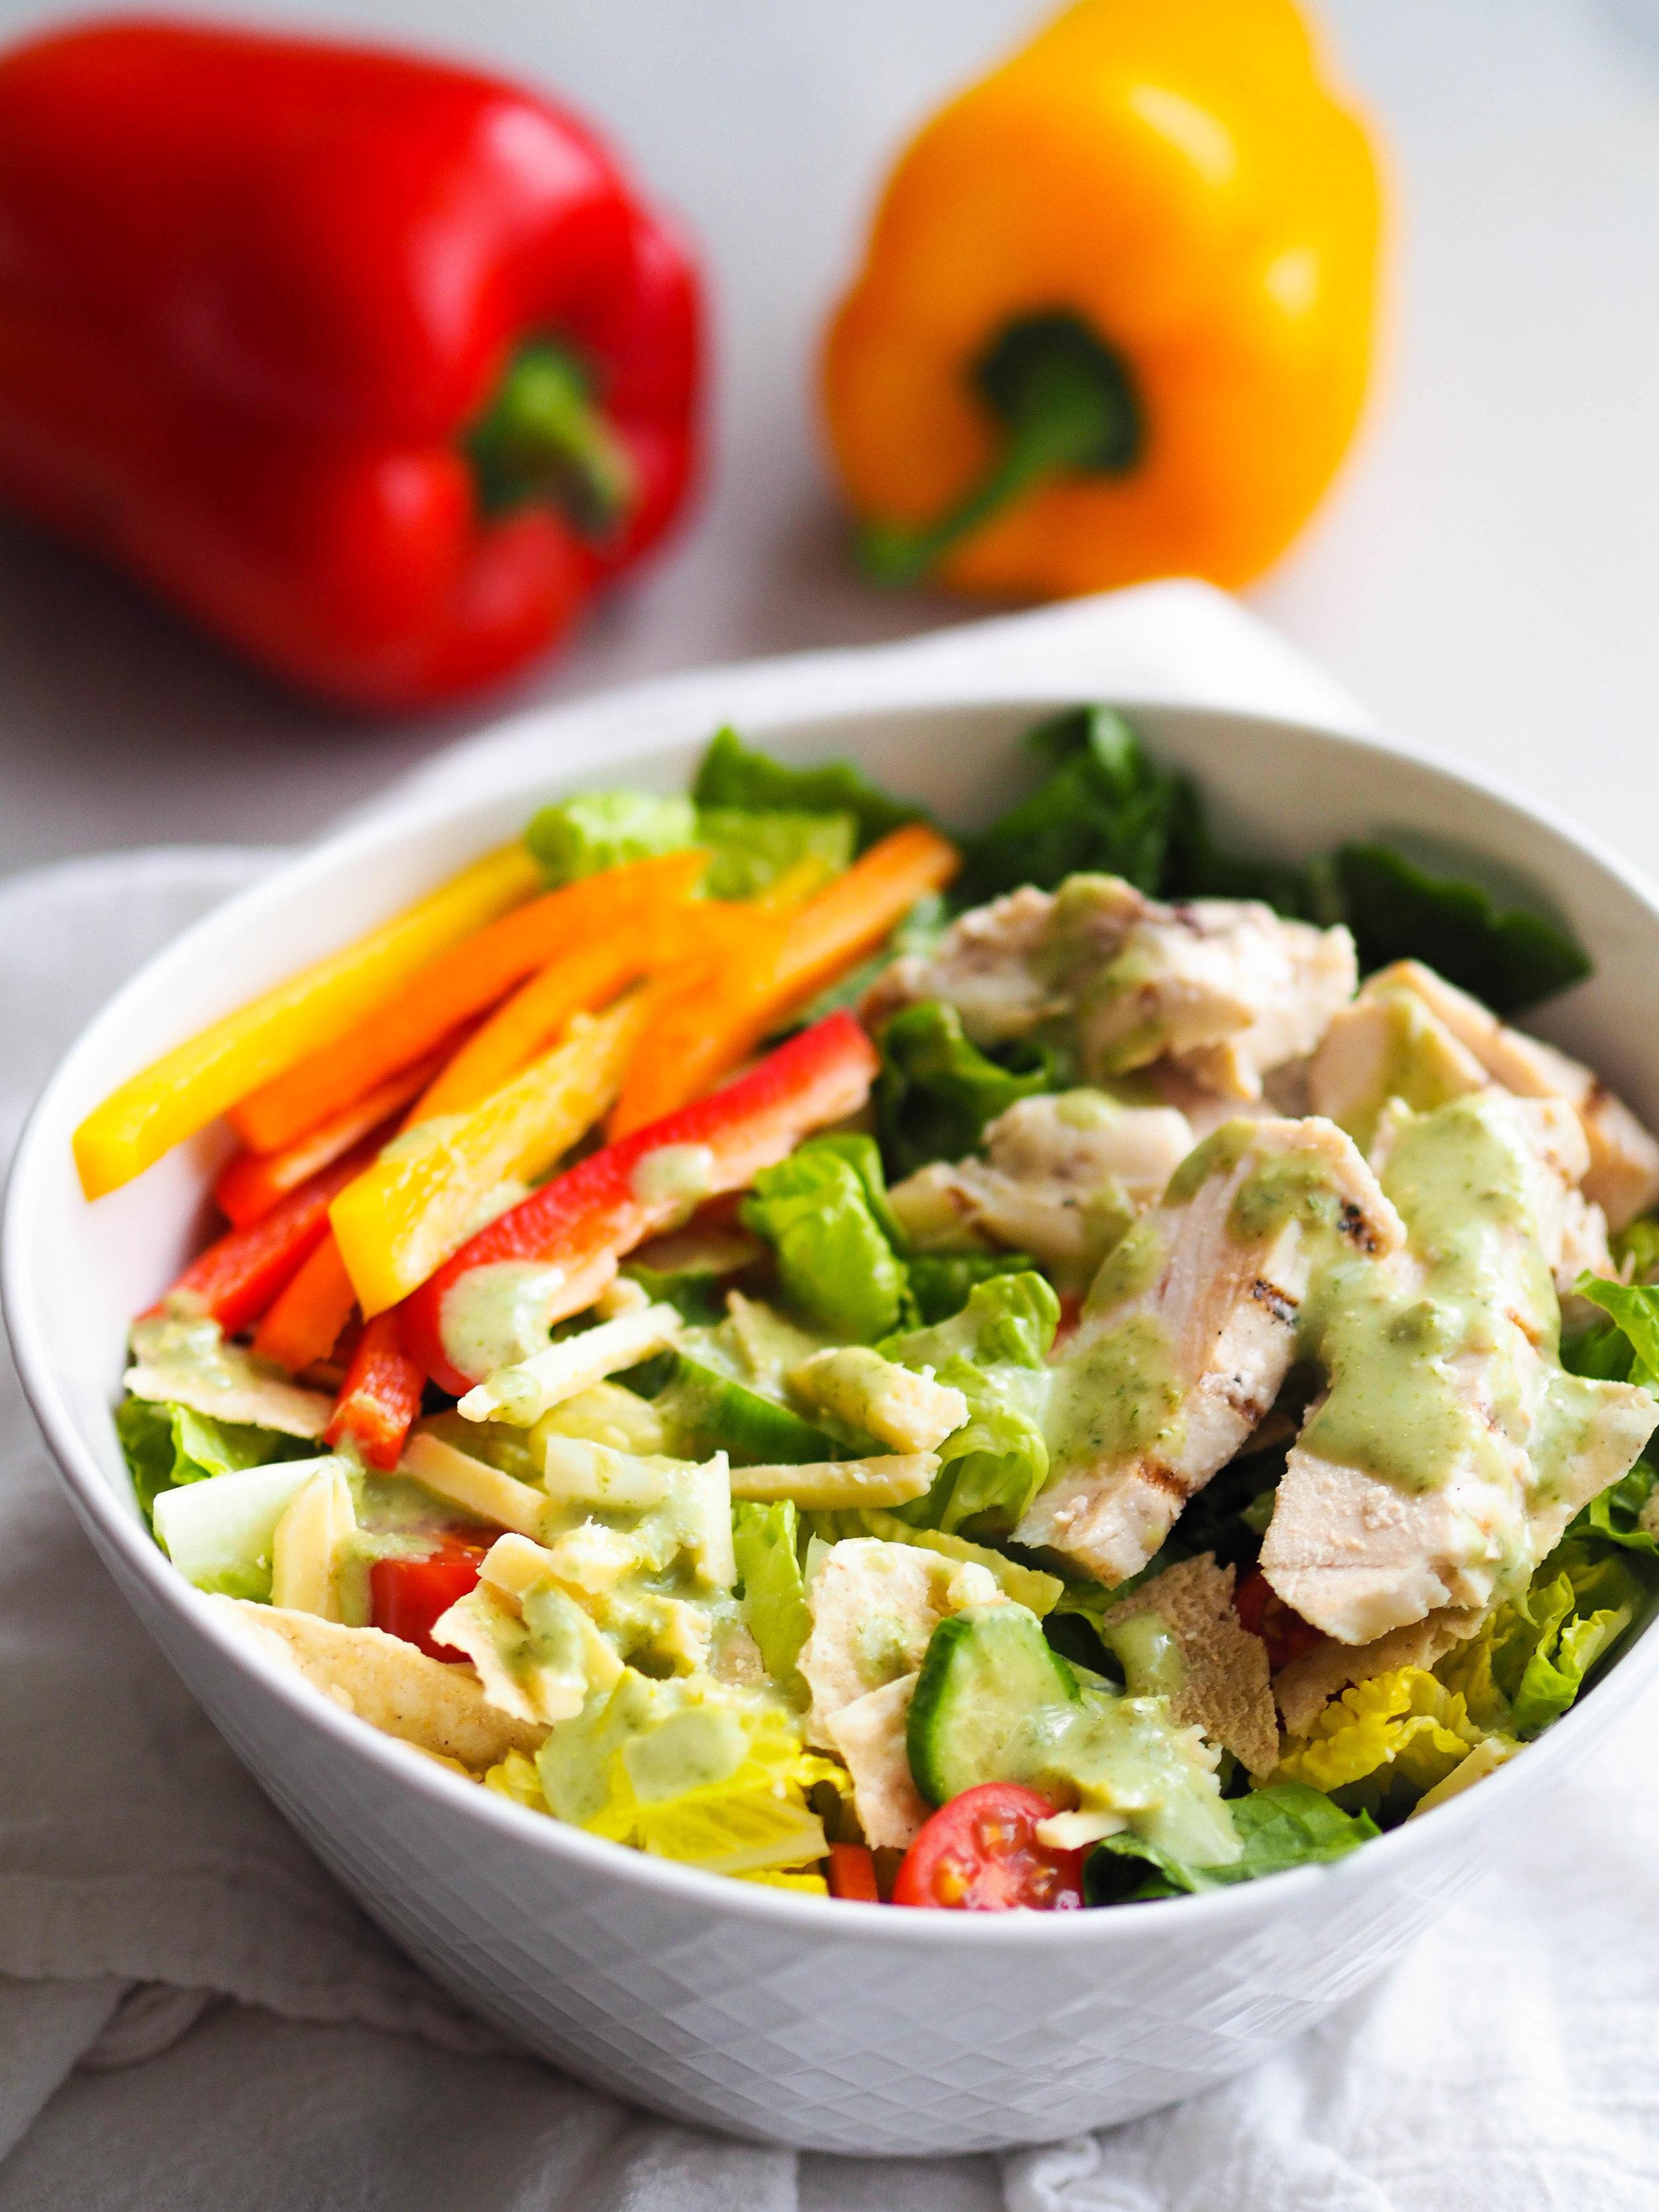 Chicken Tortilla Salad made with Crunchy Salad Mix